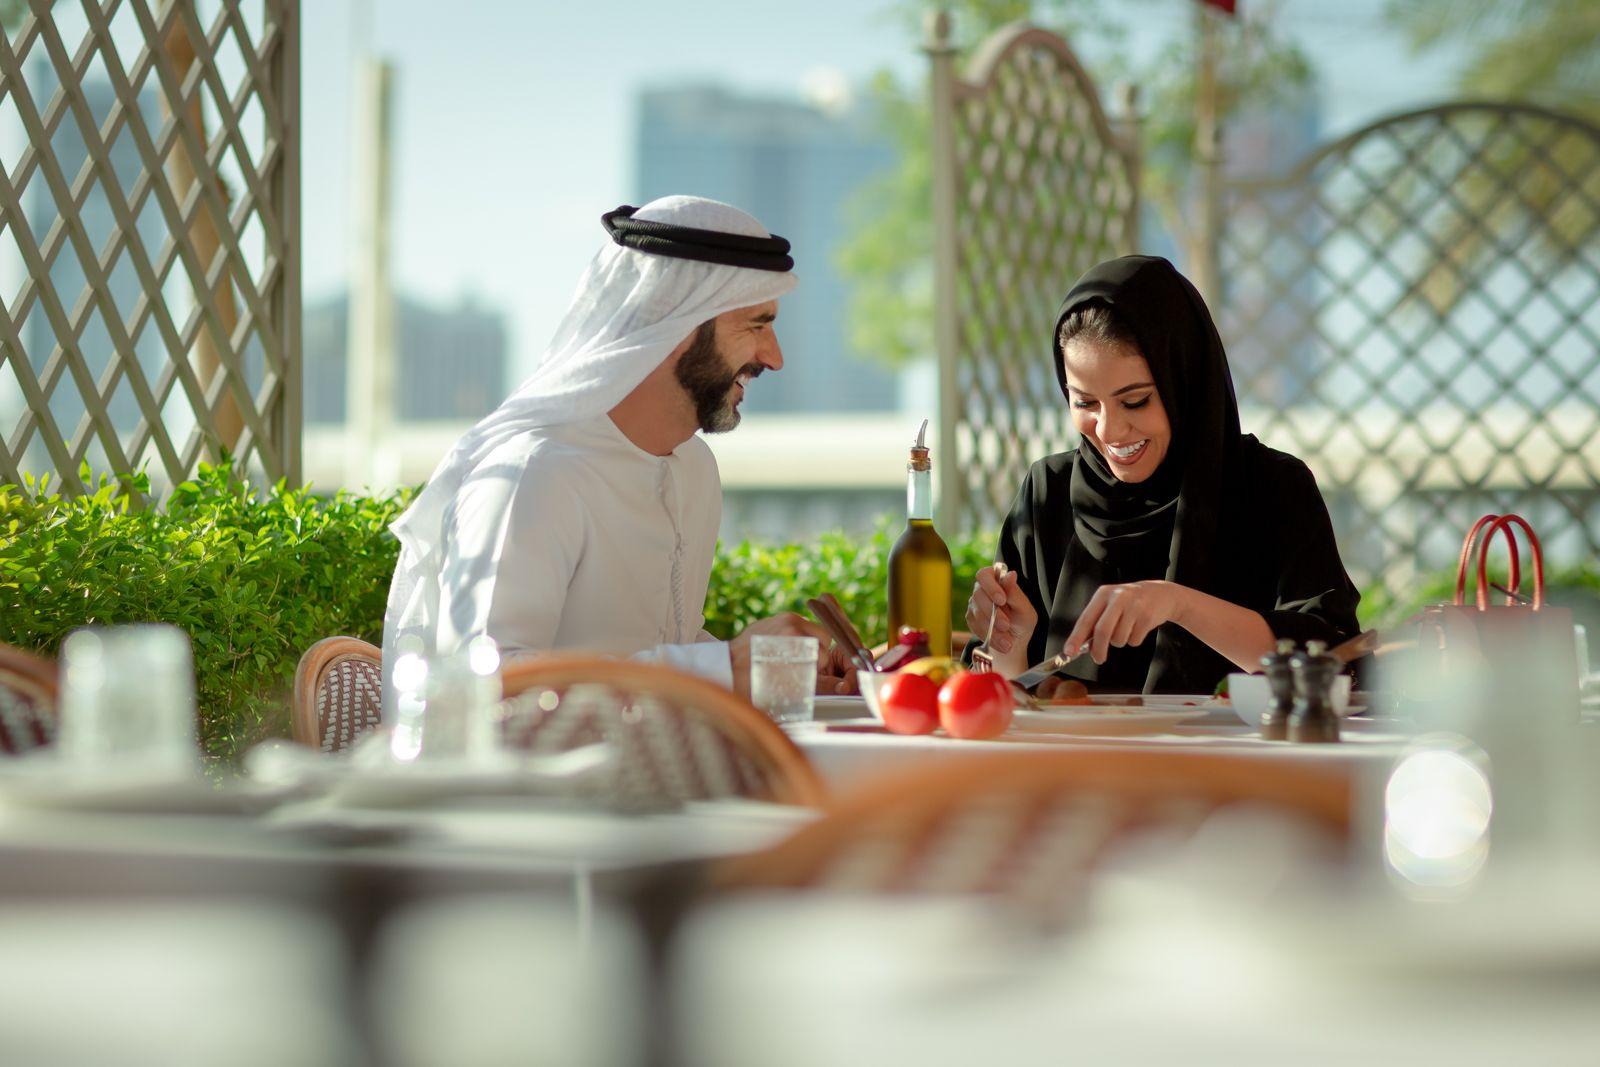 Abu Dhabi Lifestyle Photographer, Dubai Lifestyle Photographer, Saudi Arabia Advertising Photographer, Saudi Arabia Lifestyle Photographer-2681.jpg